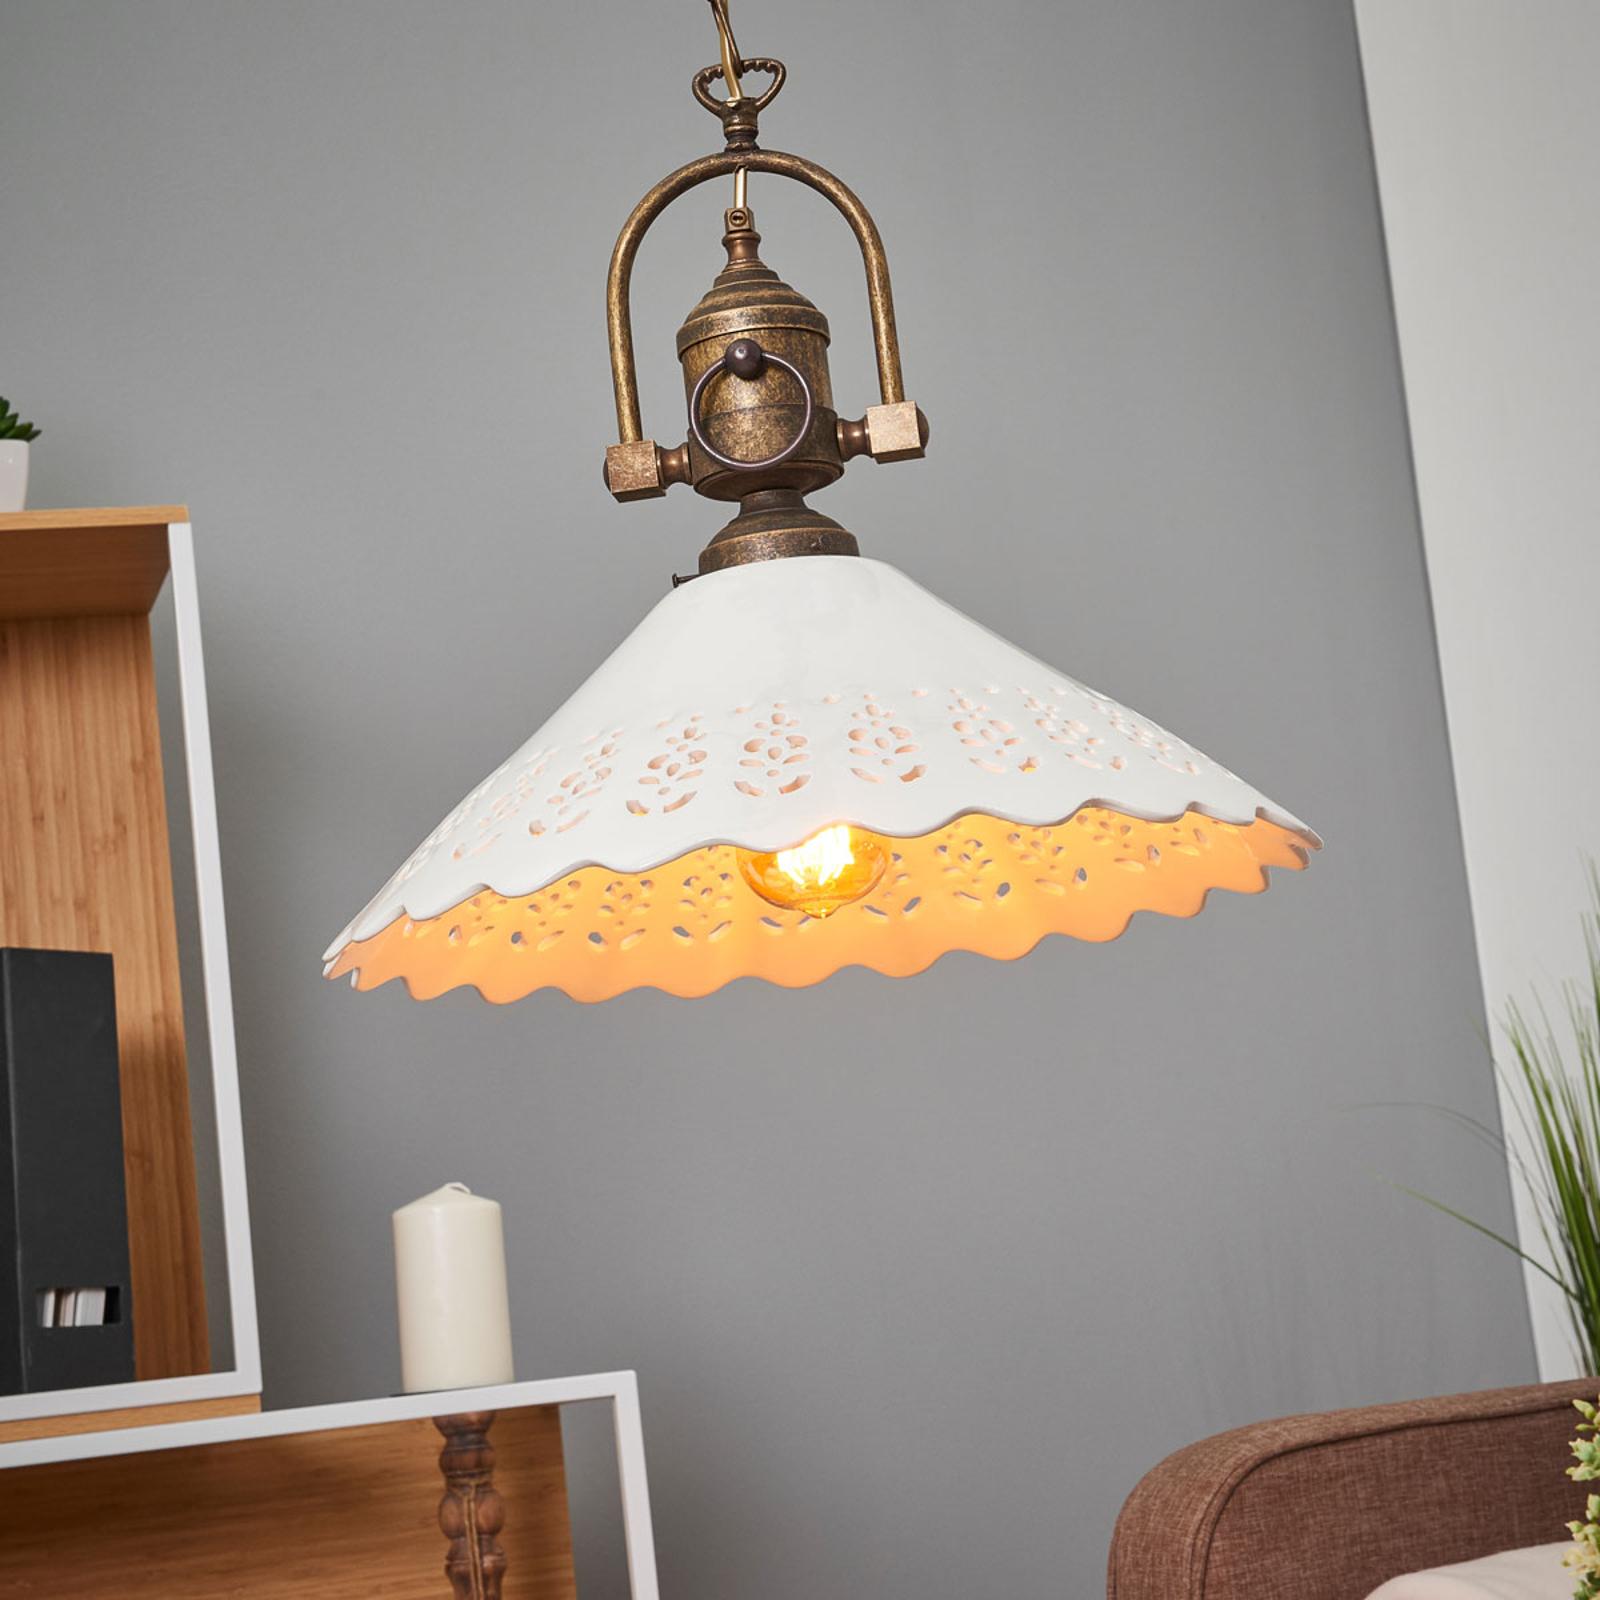 Pizzo hængelampe med kæde, 1 lyskilde